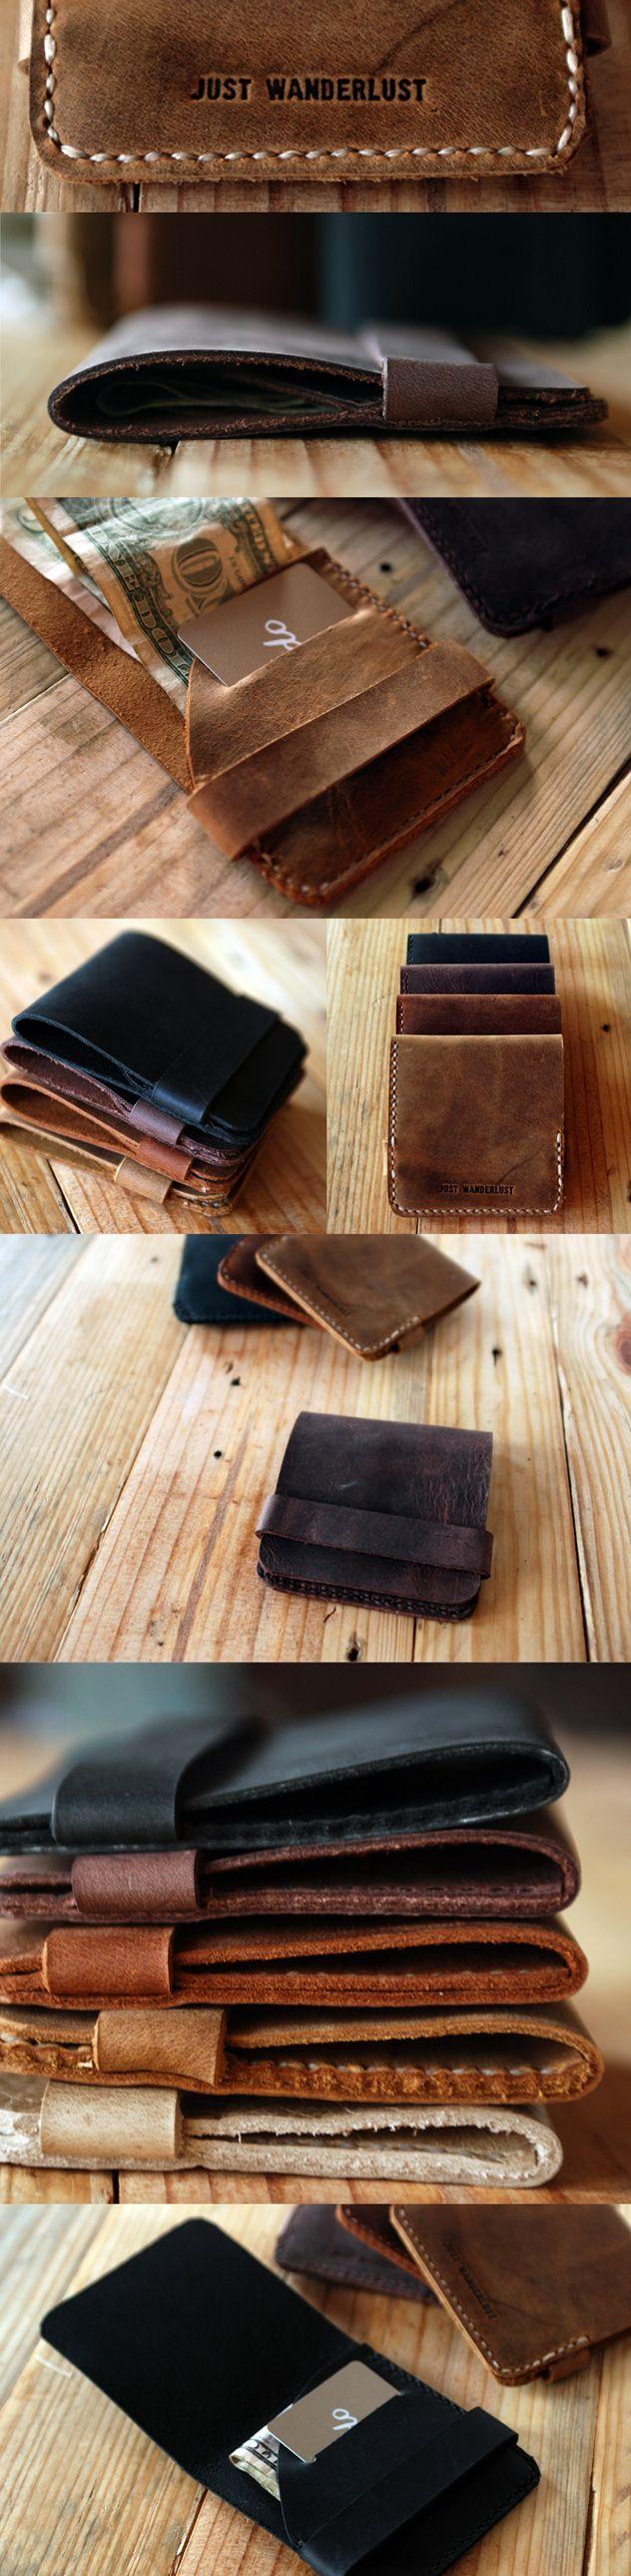 Pin von Jonathan Thongsawasdi auf Leather | Pinterest | Leder ...